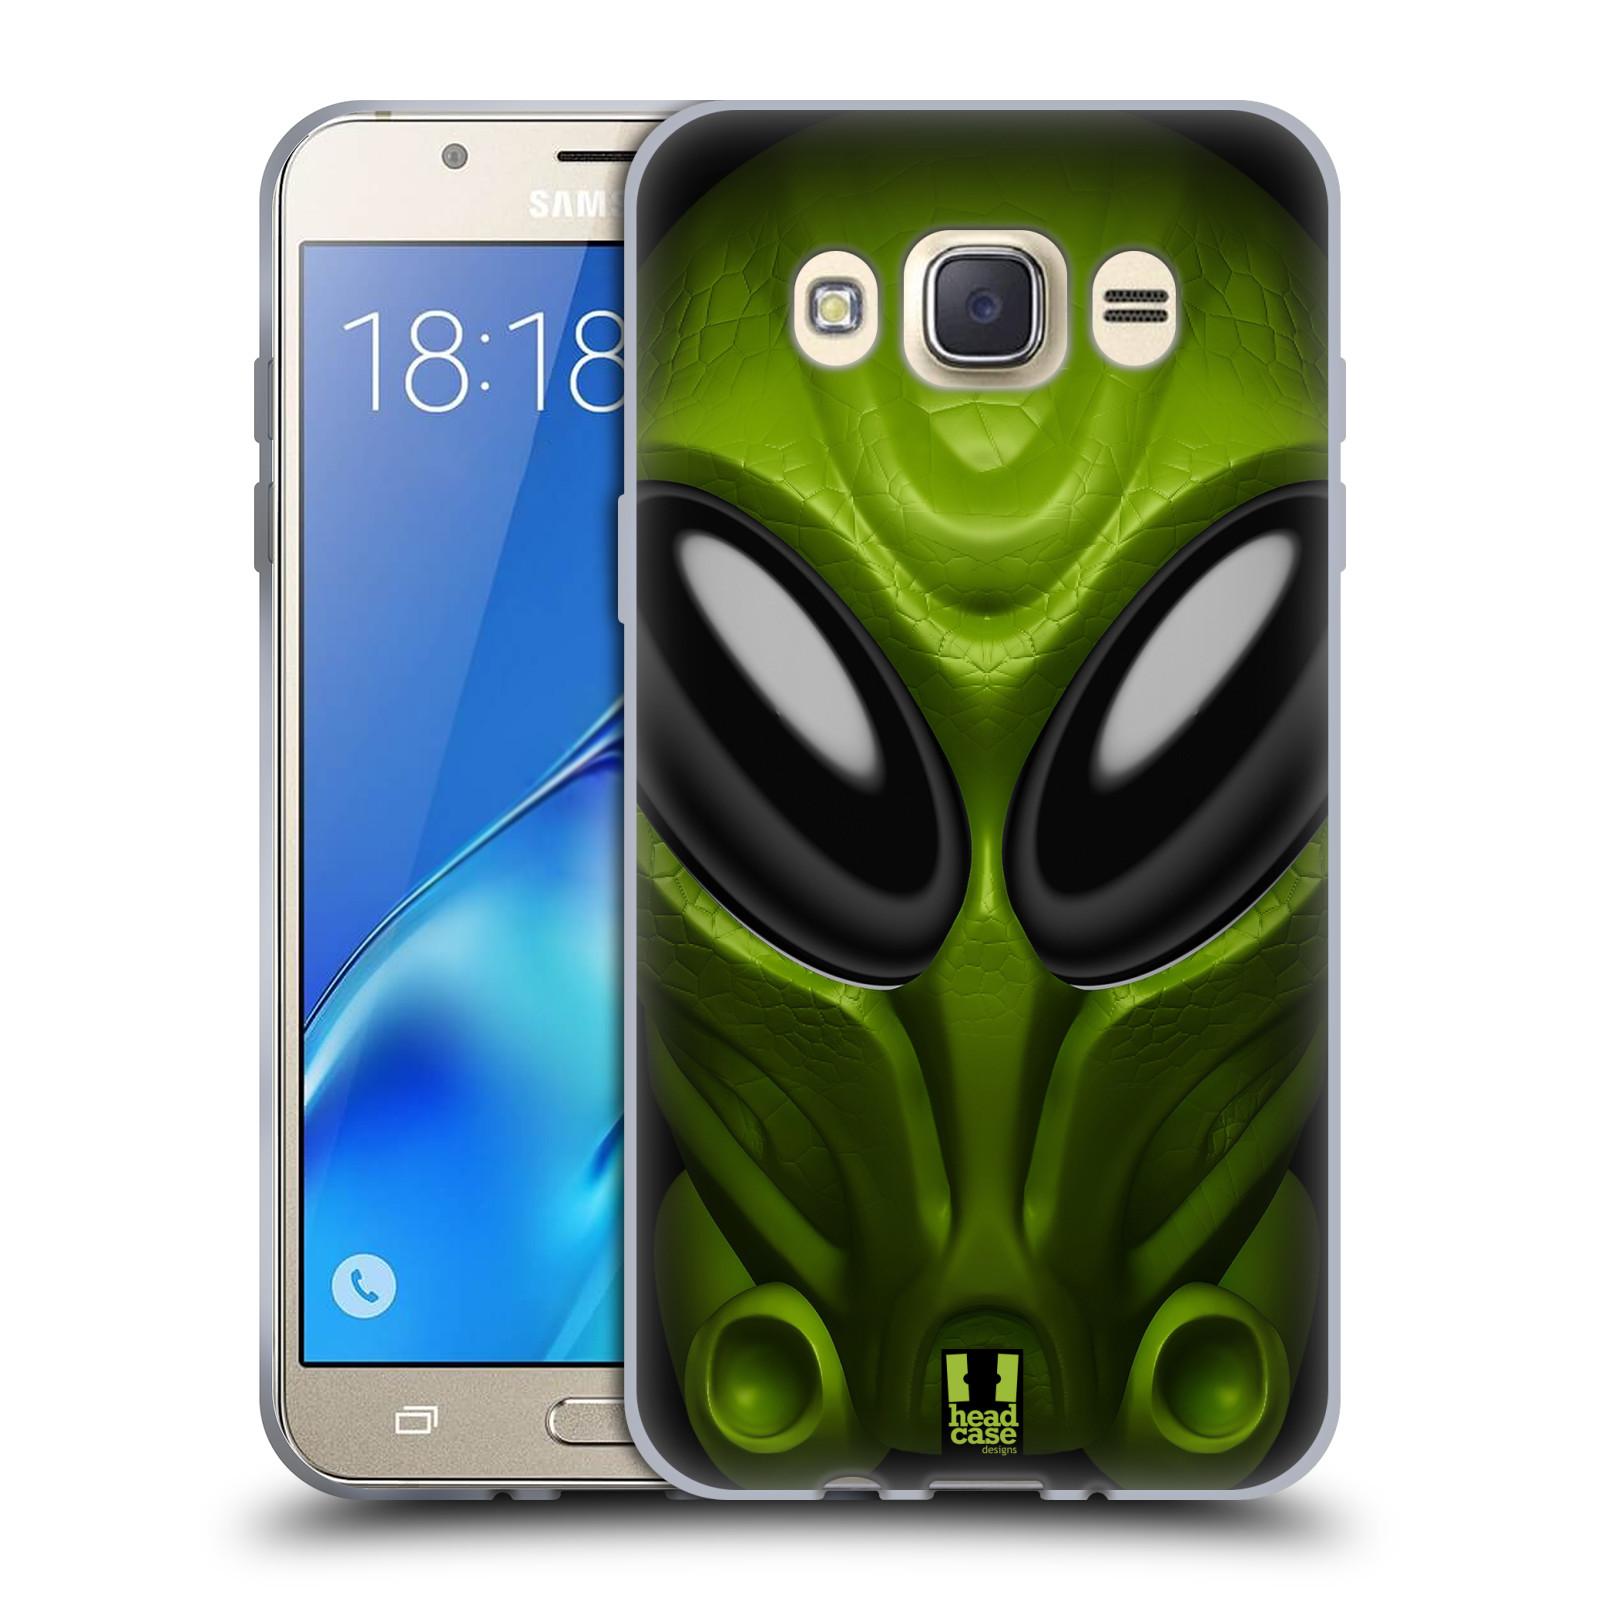 Silikonové pouzdro na mobil Samsung Galaxy J7 (2016) - Head Case - Ufoun Mastermind